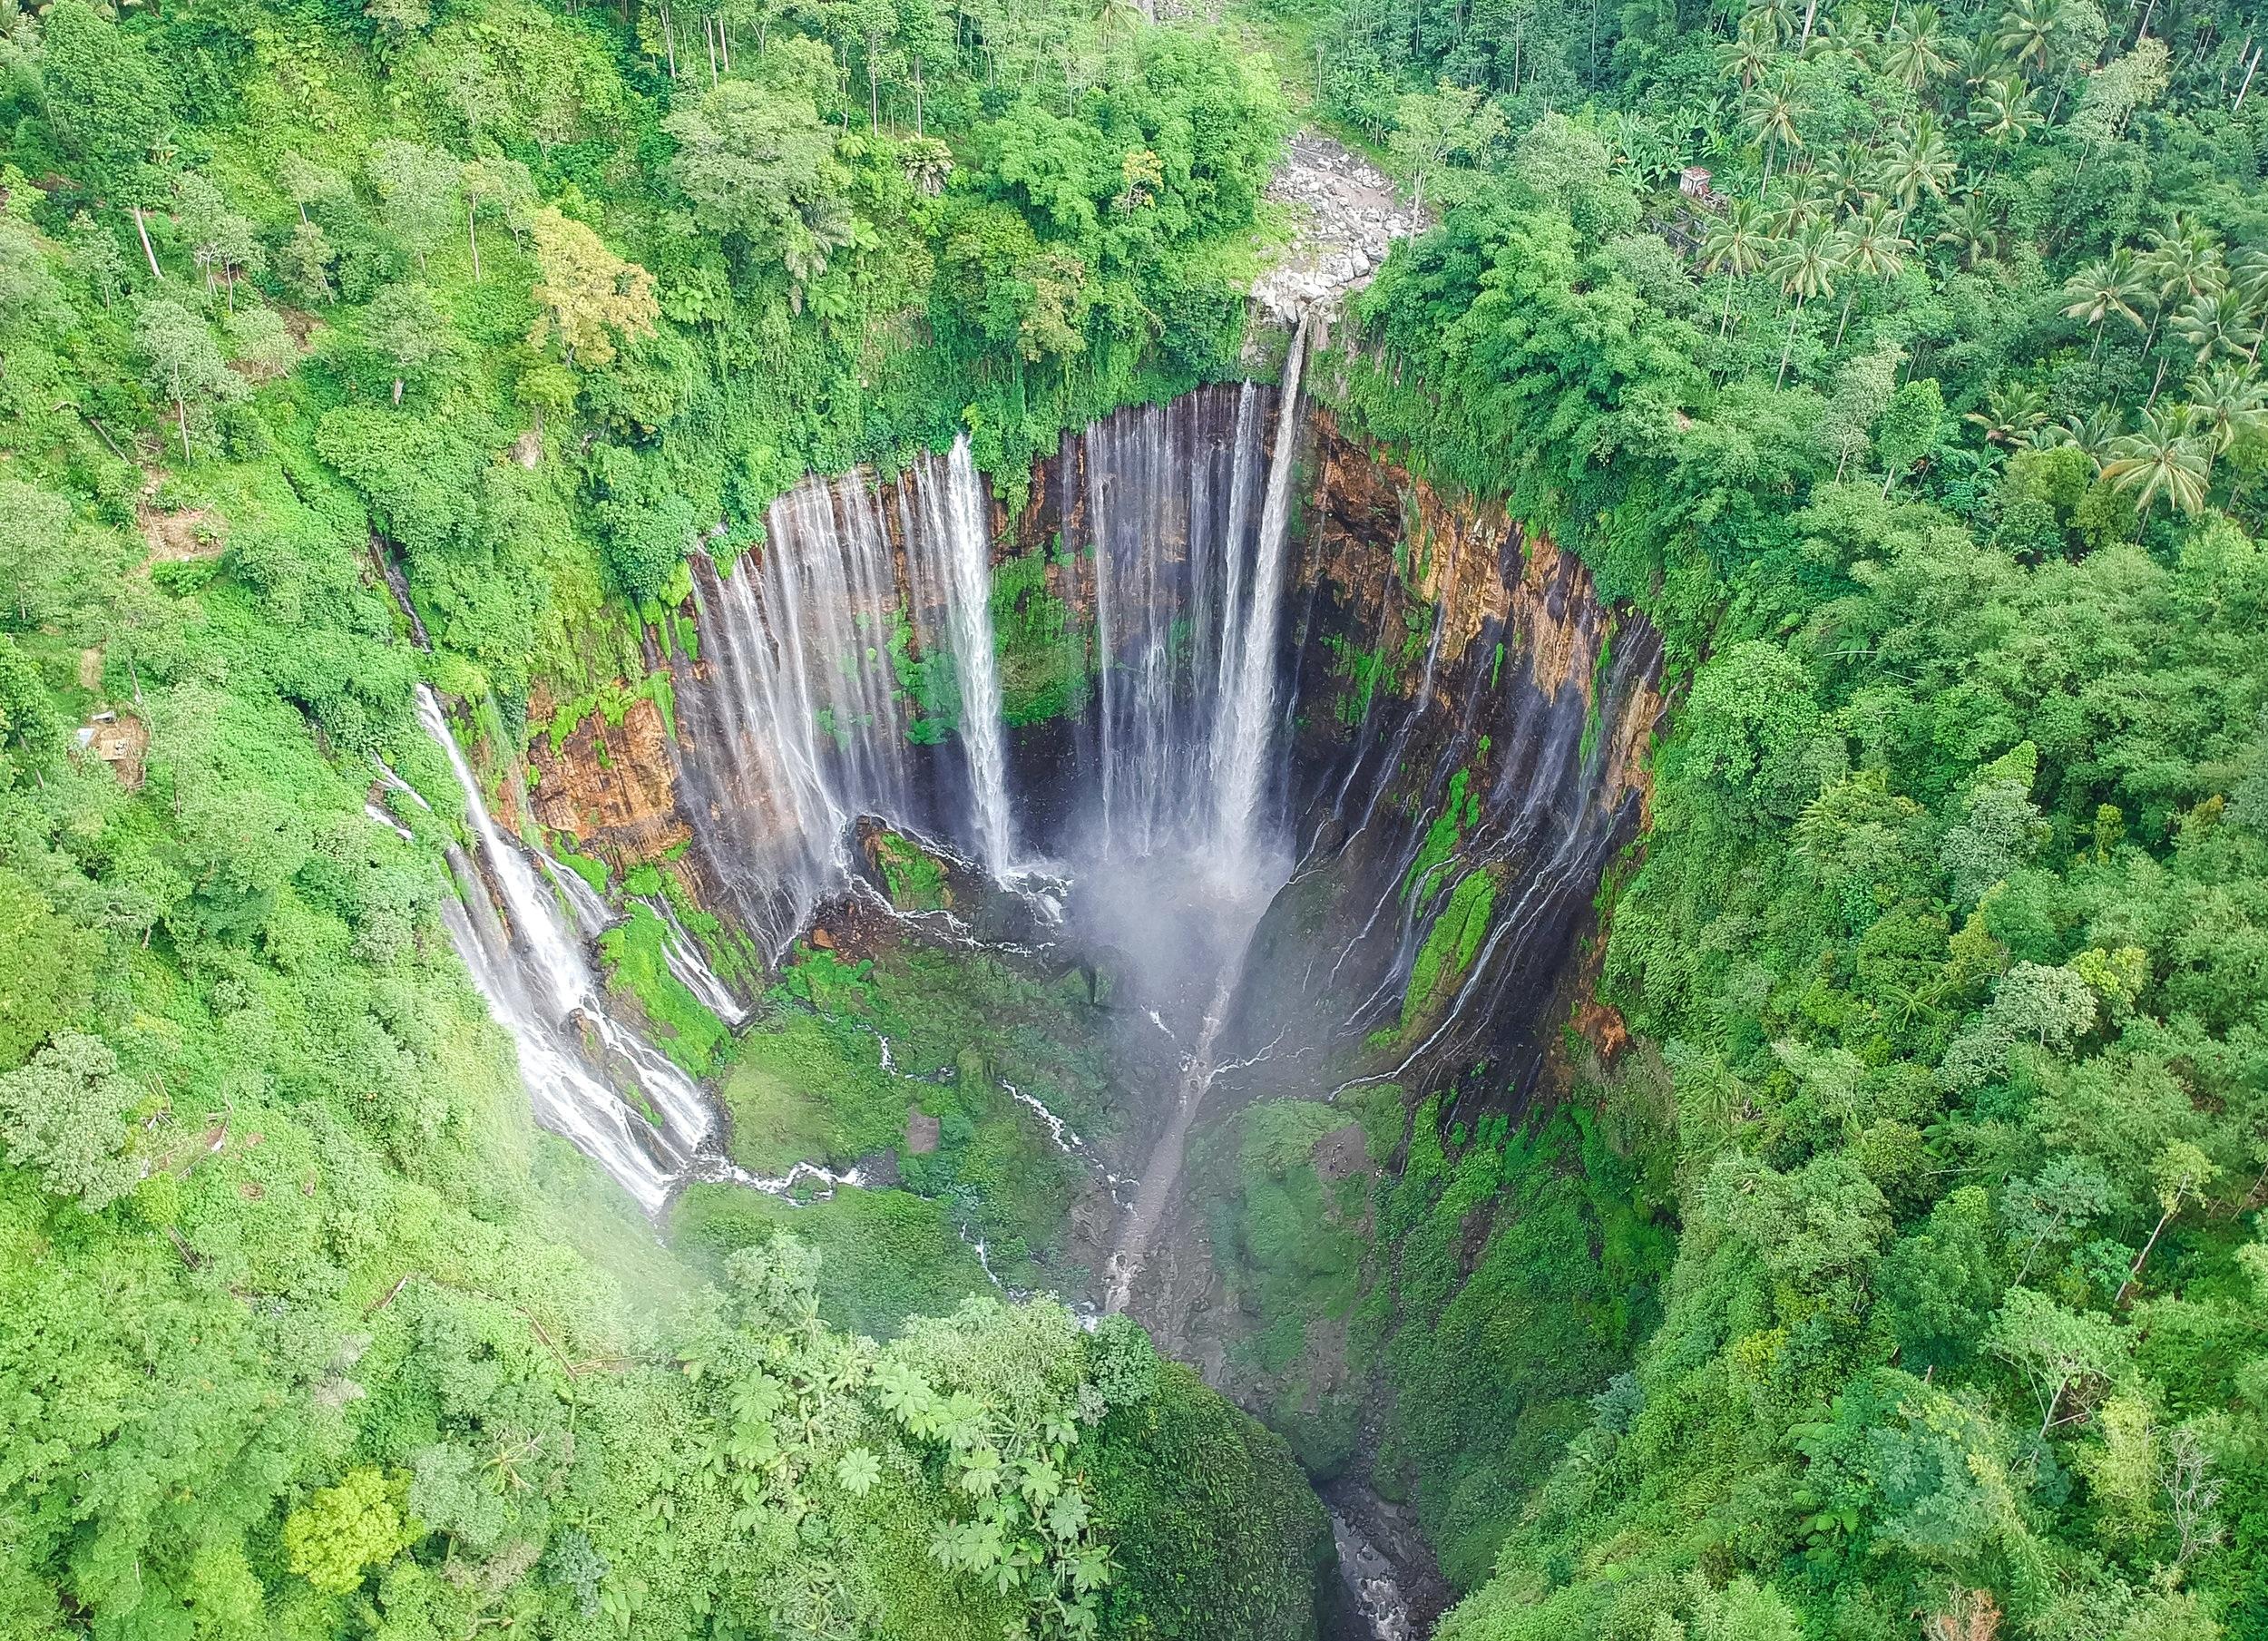 curio.trips.indonesia.java.waterfall.horseshoe.drone.jpg